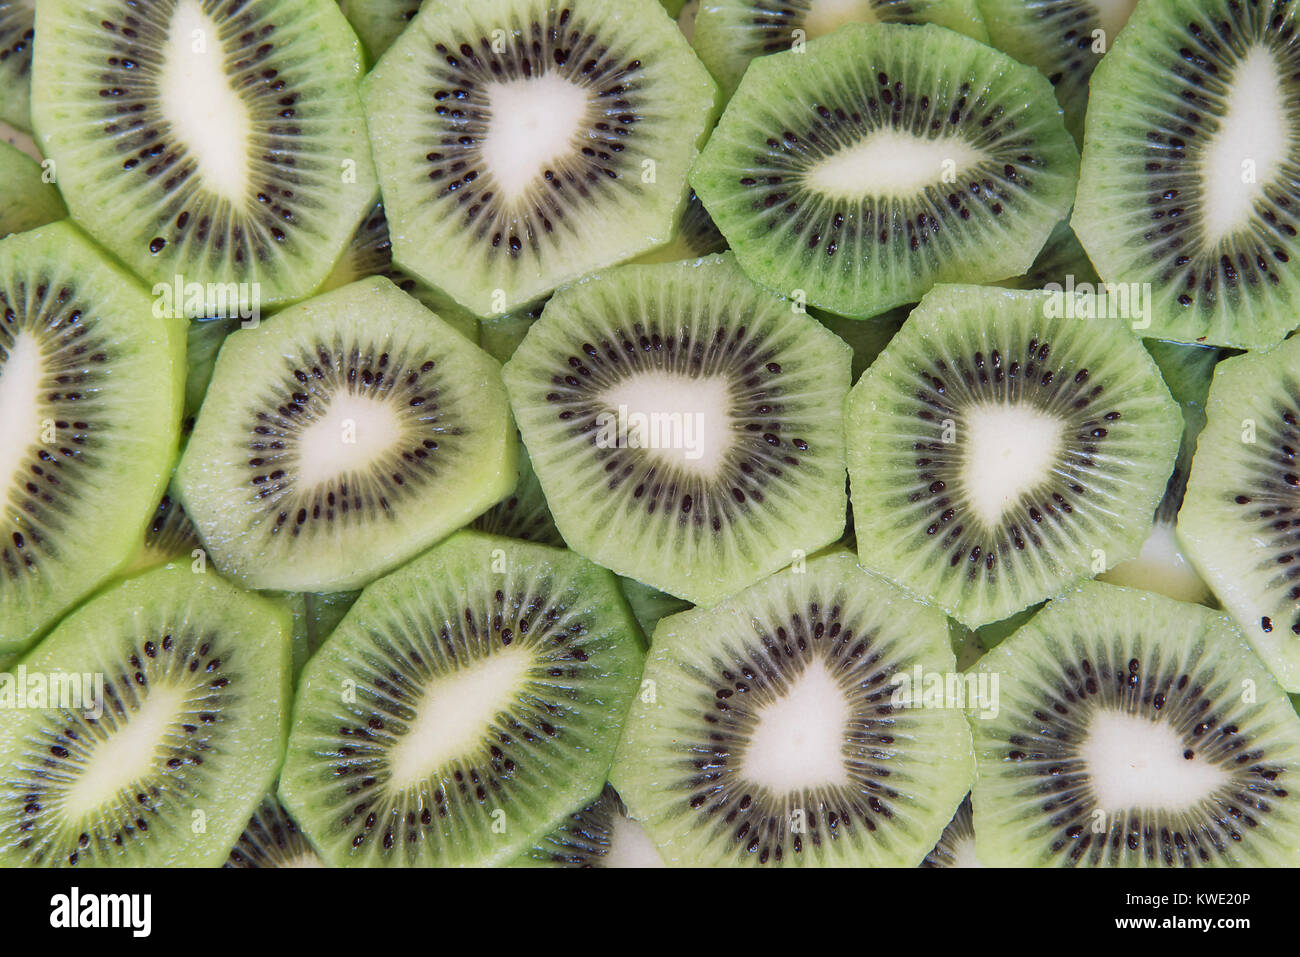 green slices of kiwi fruit texture background Stock Photo